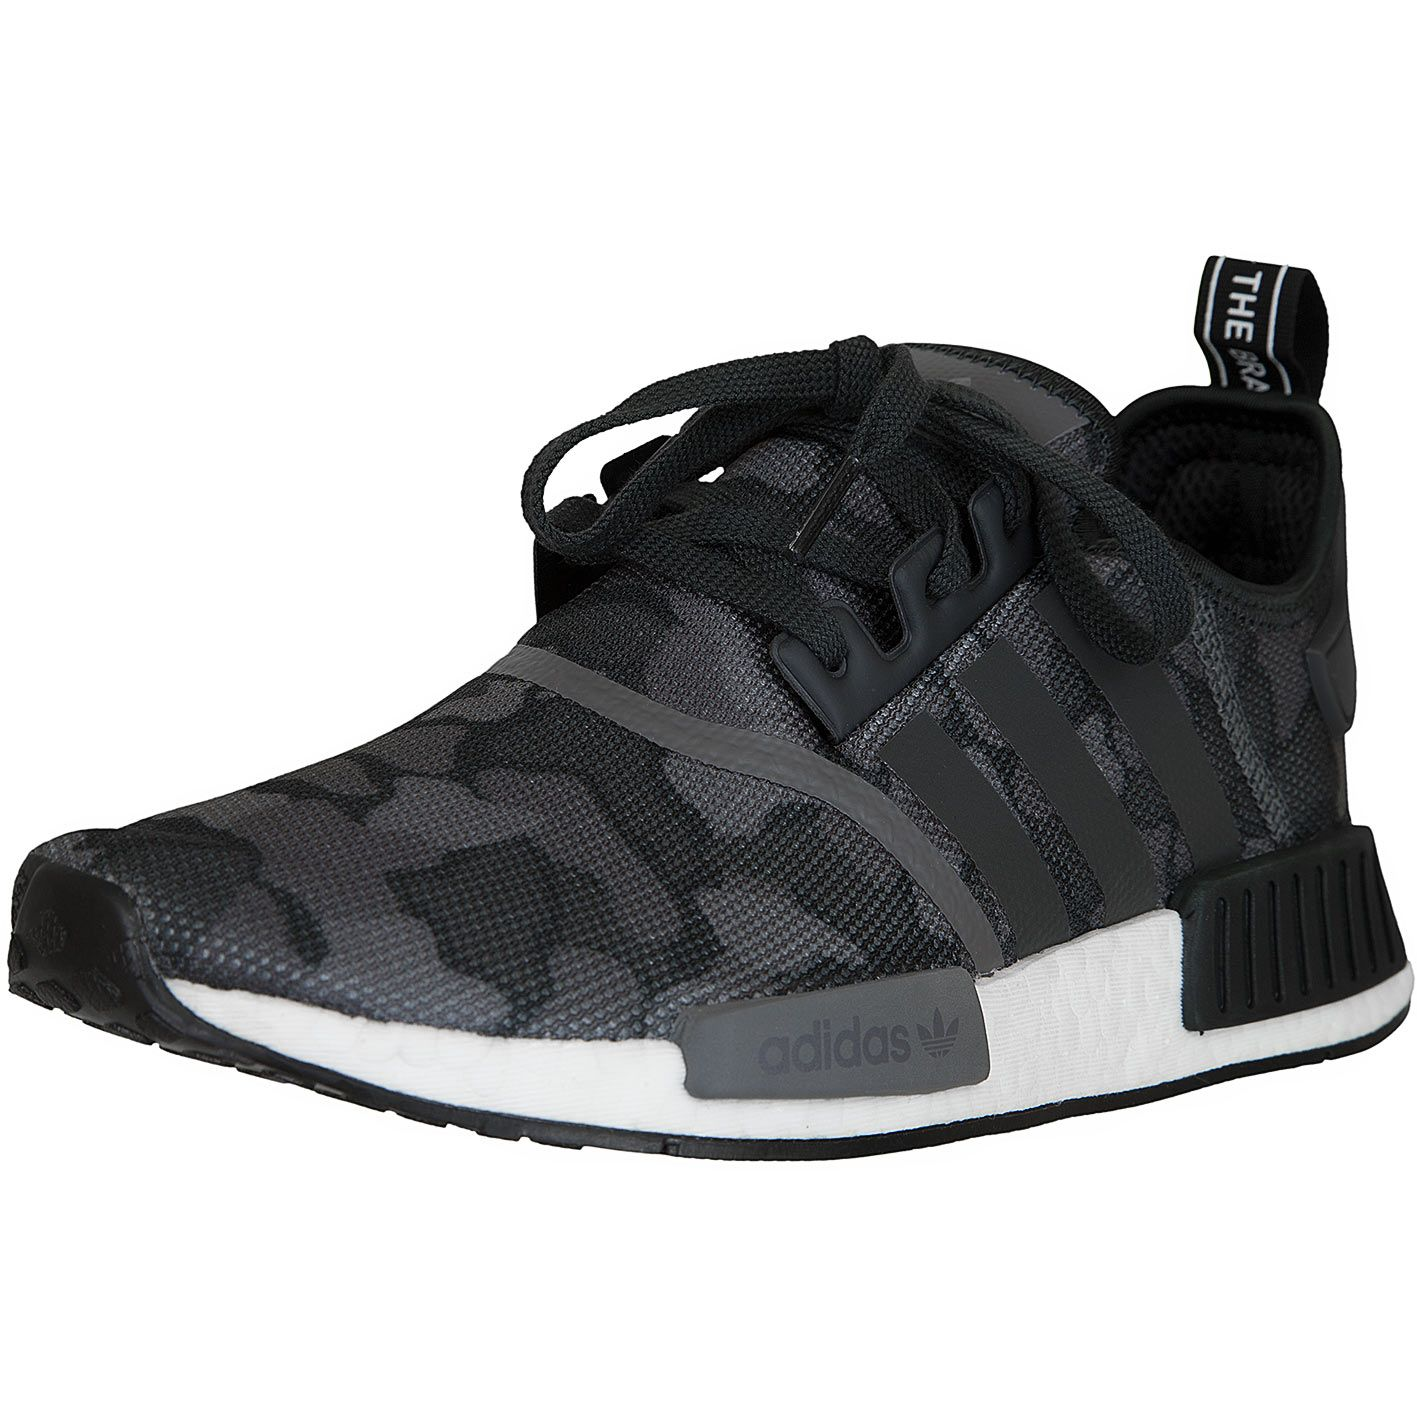 ☆ Adidas Originals Sneaker NMD R1 schwarzgrau hier